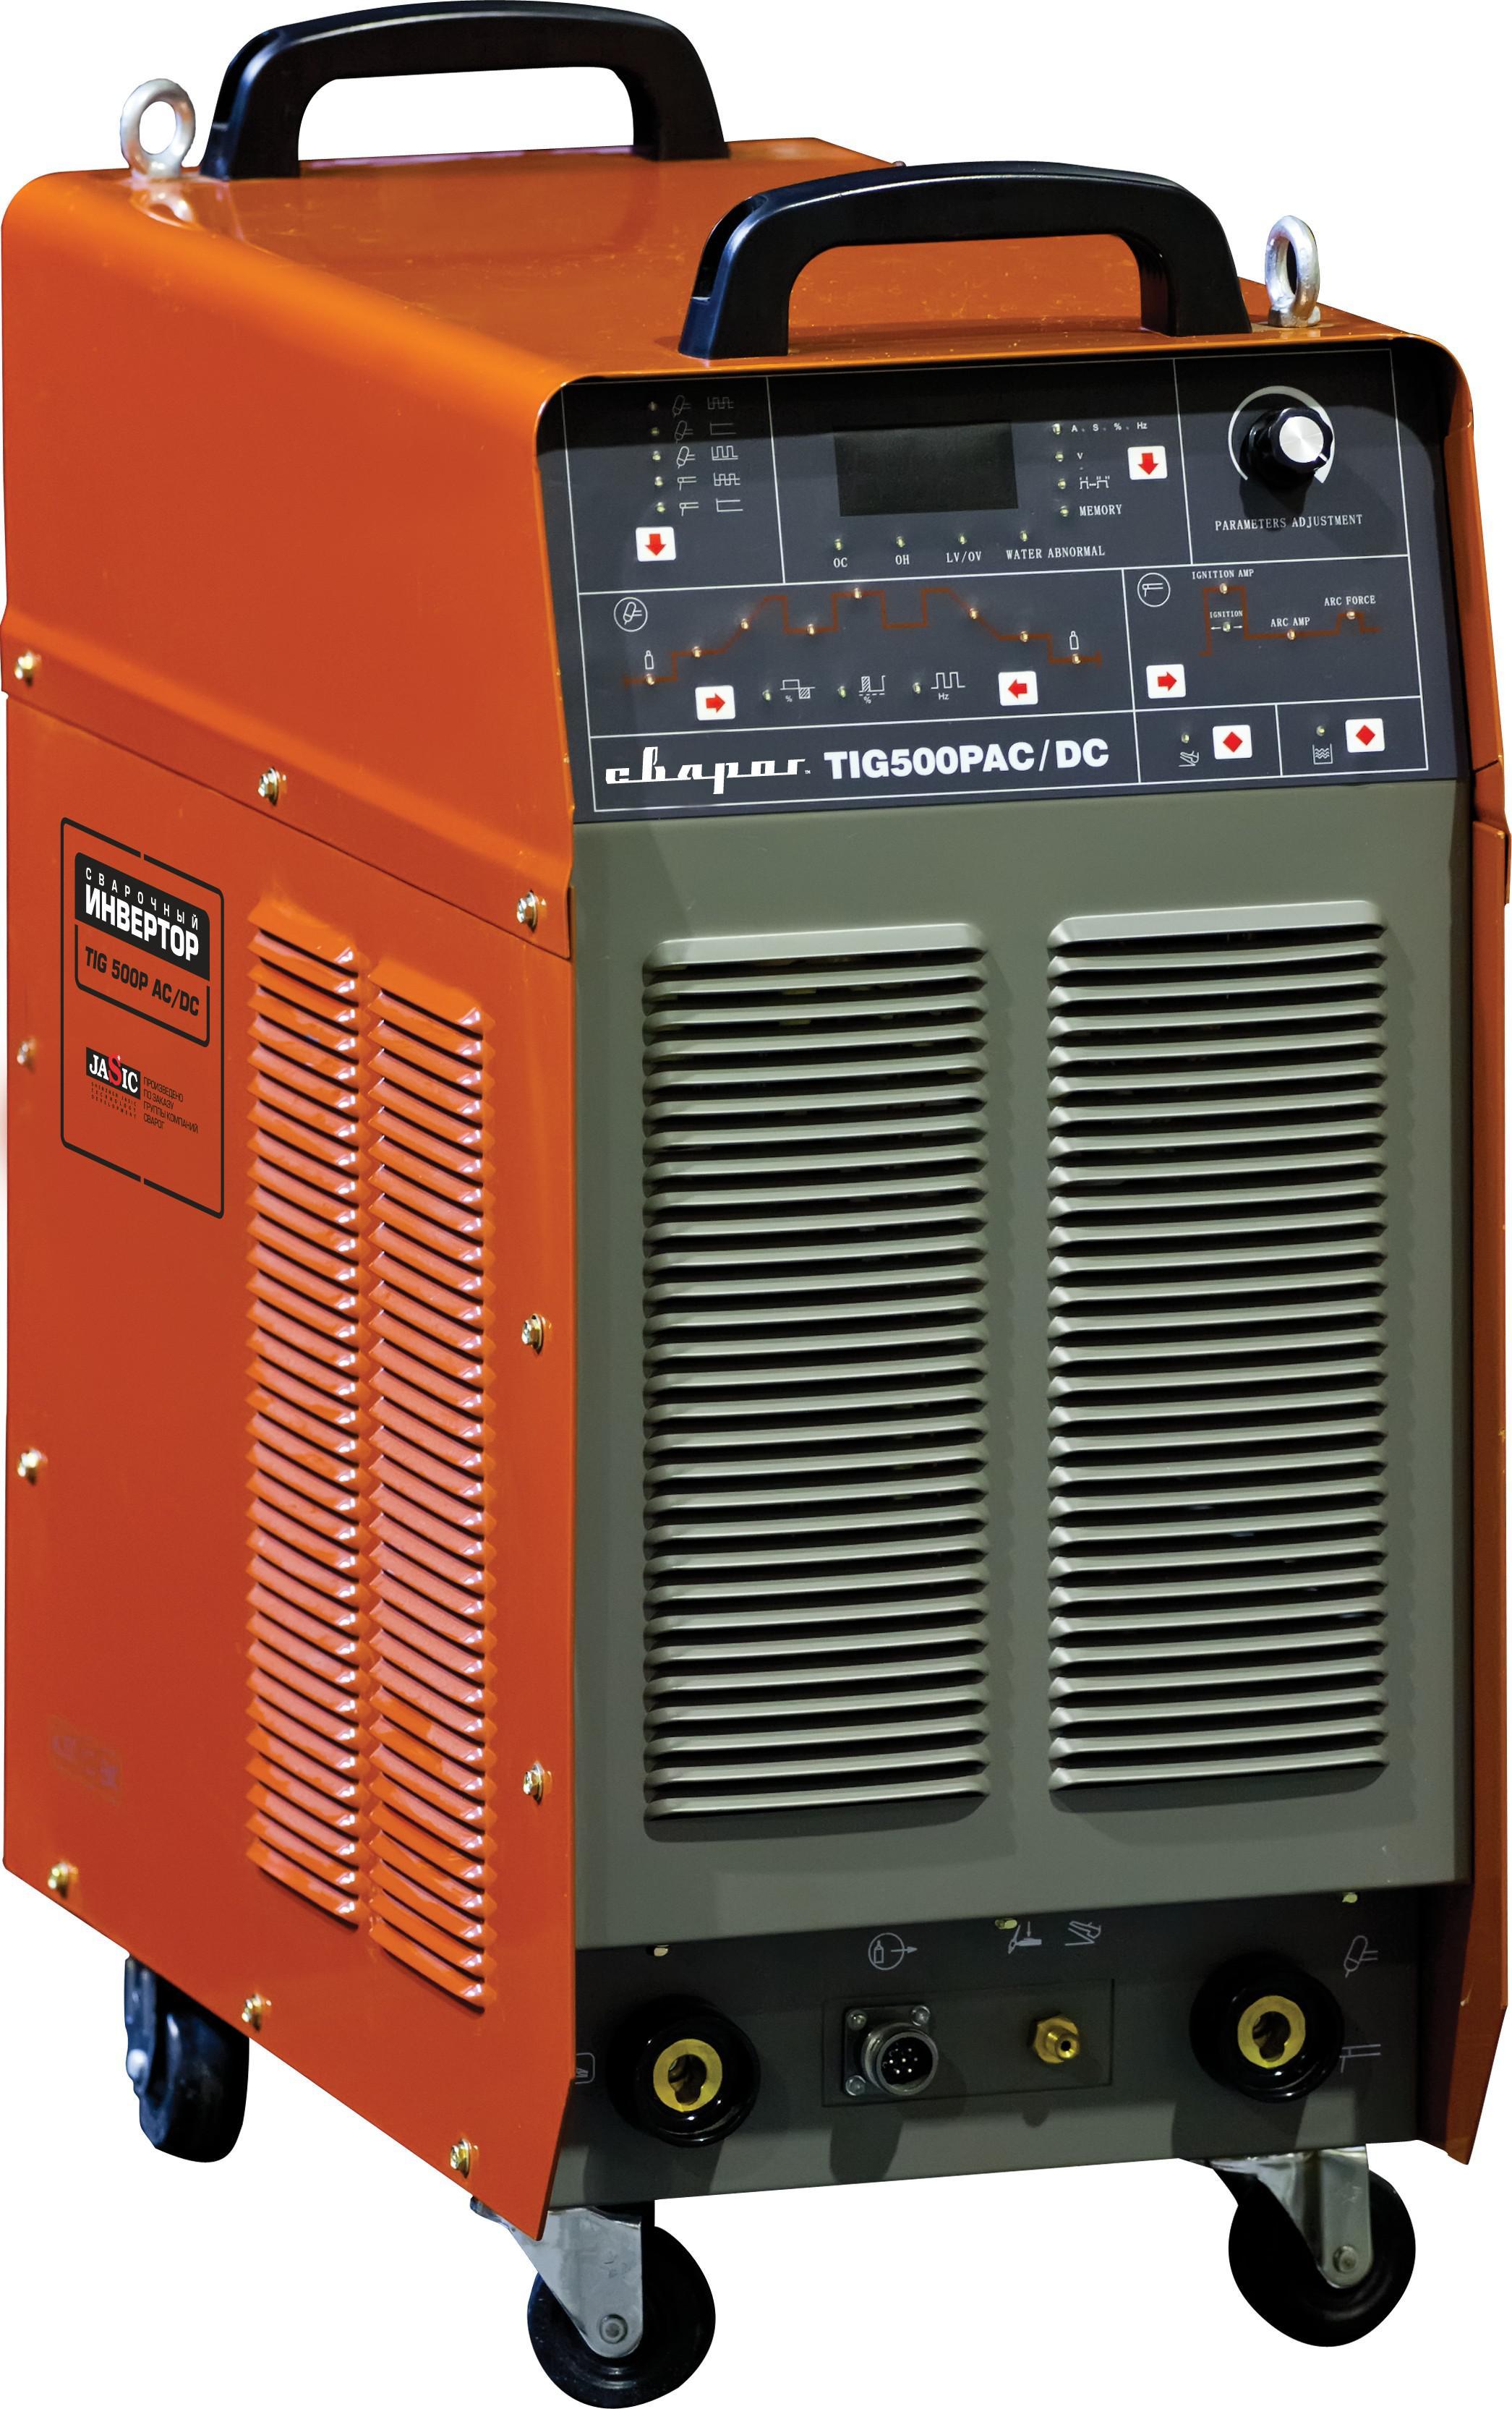 Сварочный аппарат СВАРОГ Tig 500p dsp ac/dc (j1210) сварочный аппарат сварог pro tig 200 p dsp w212